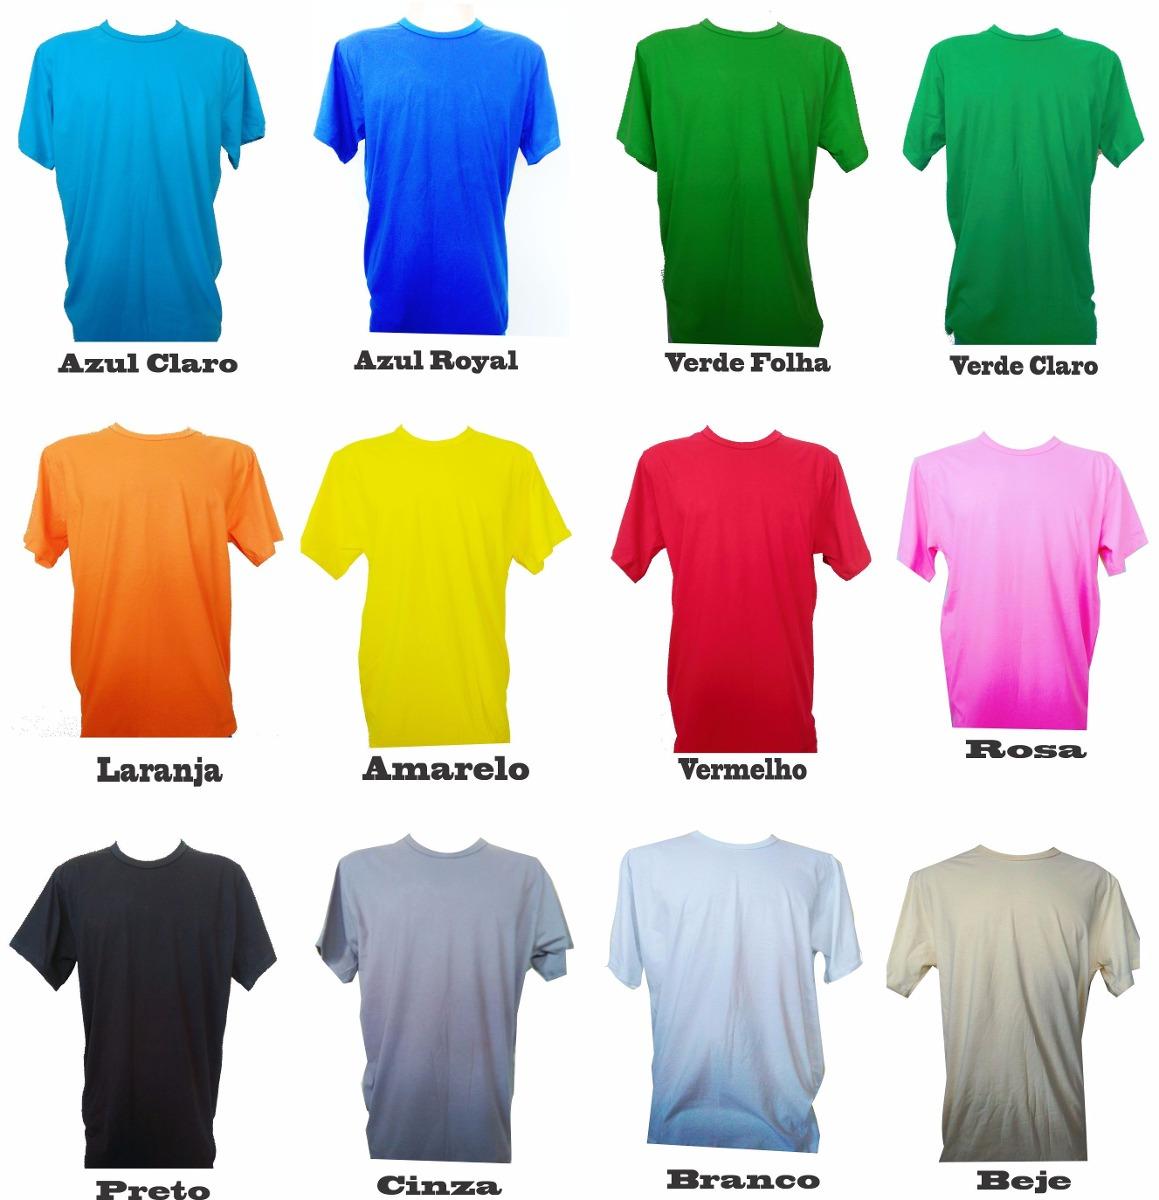 Kit 10 Camisas Lisa Malha 30 100% Algodão - Atacado Colorida - R ... f7eaeb3c5a8